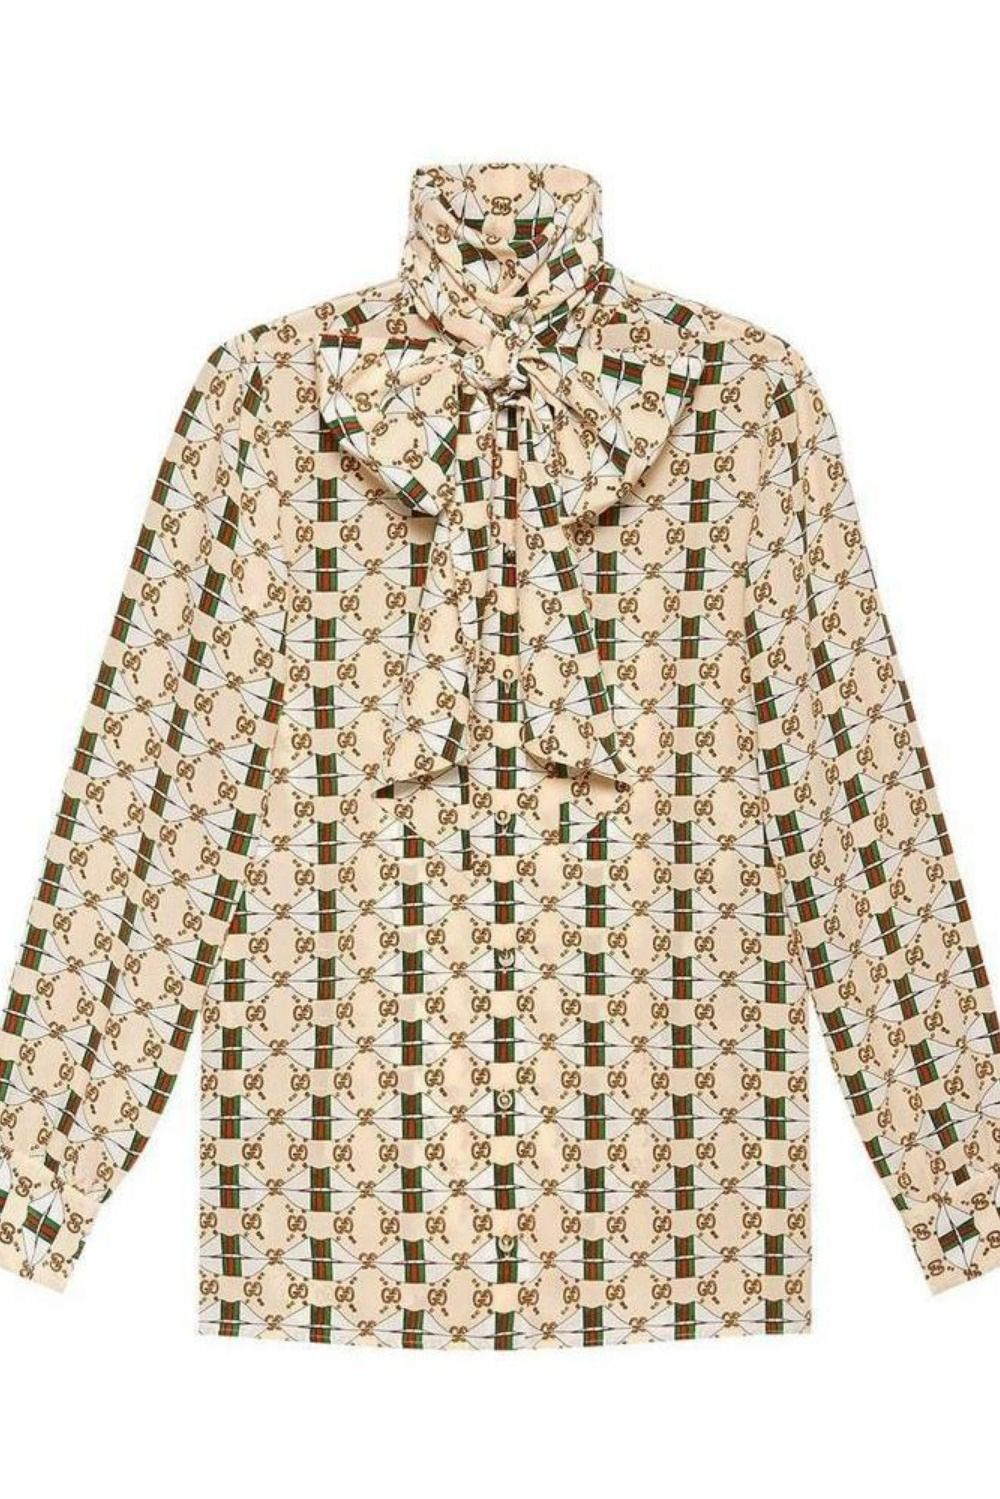 a9b69c686 Silk shirt with Web GG print Ivory silk Silk shirt with Web GG print from  Gucci